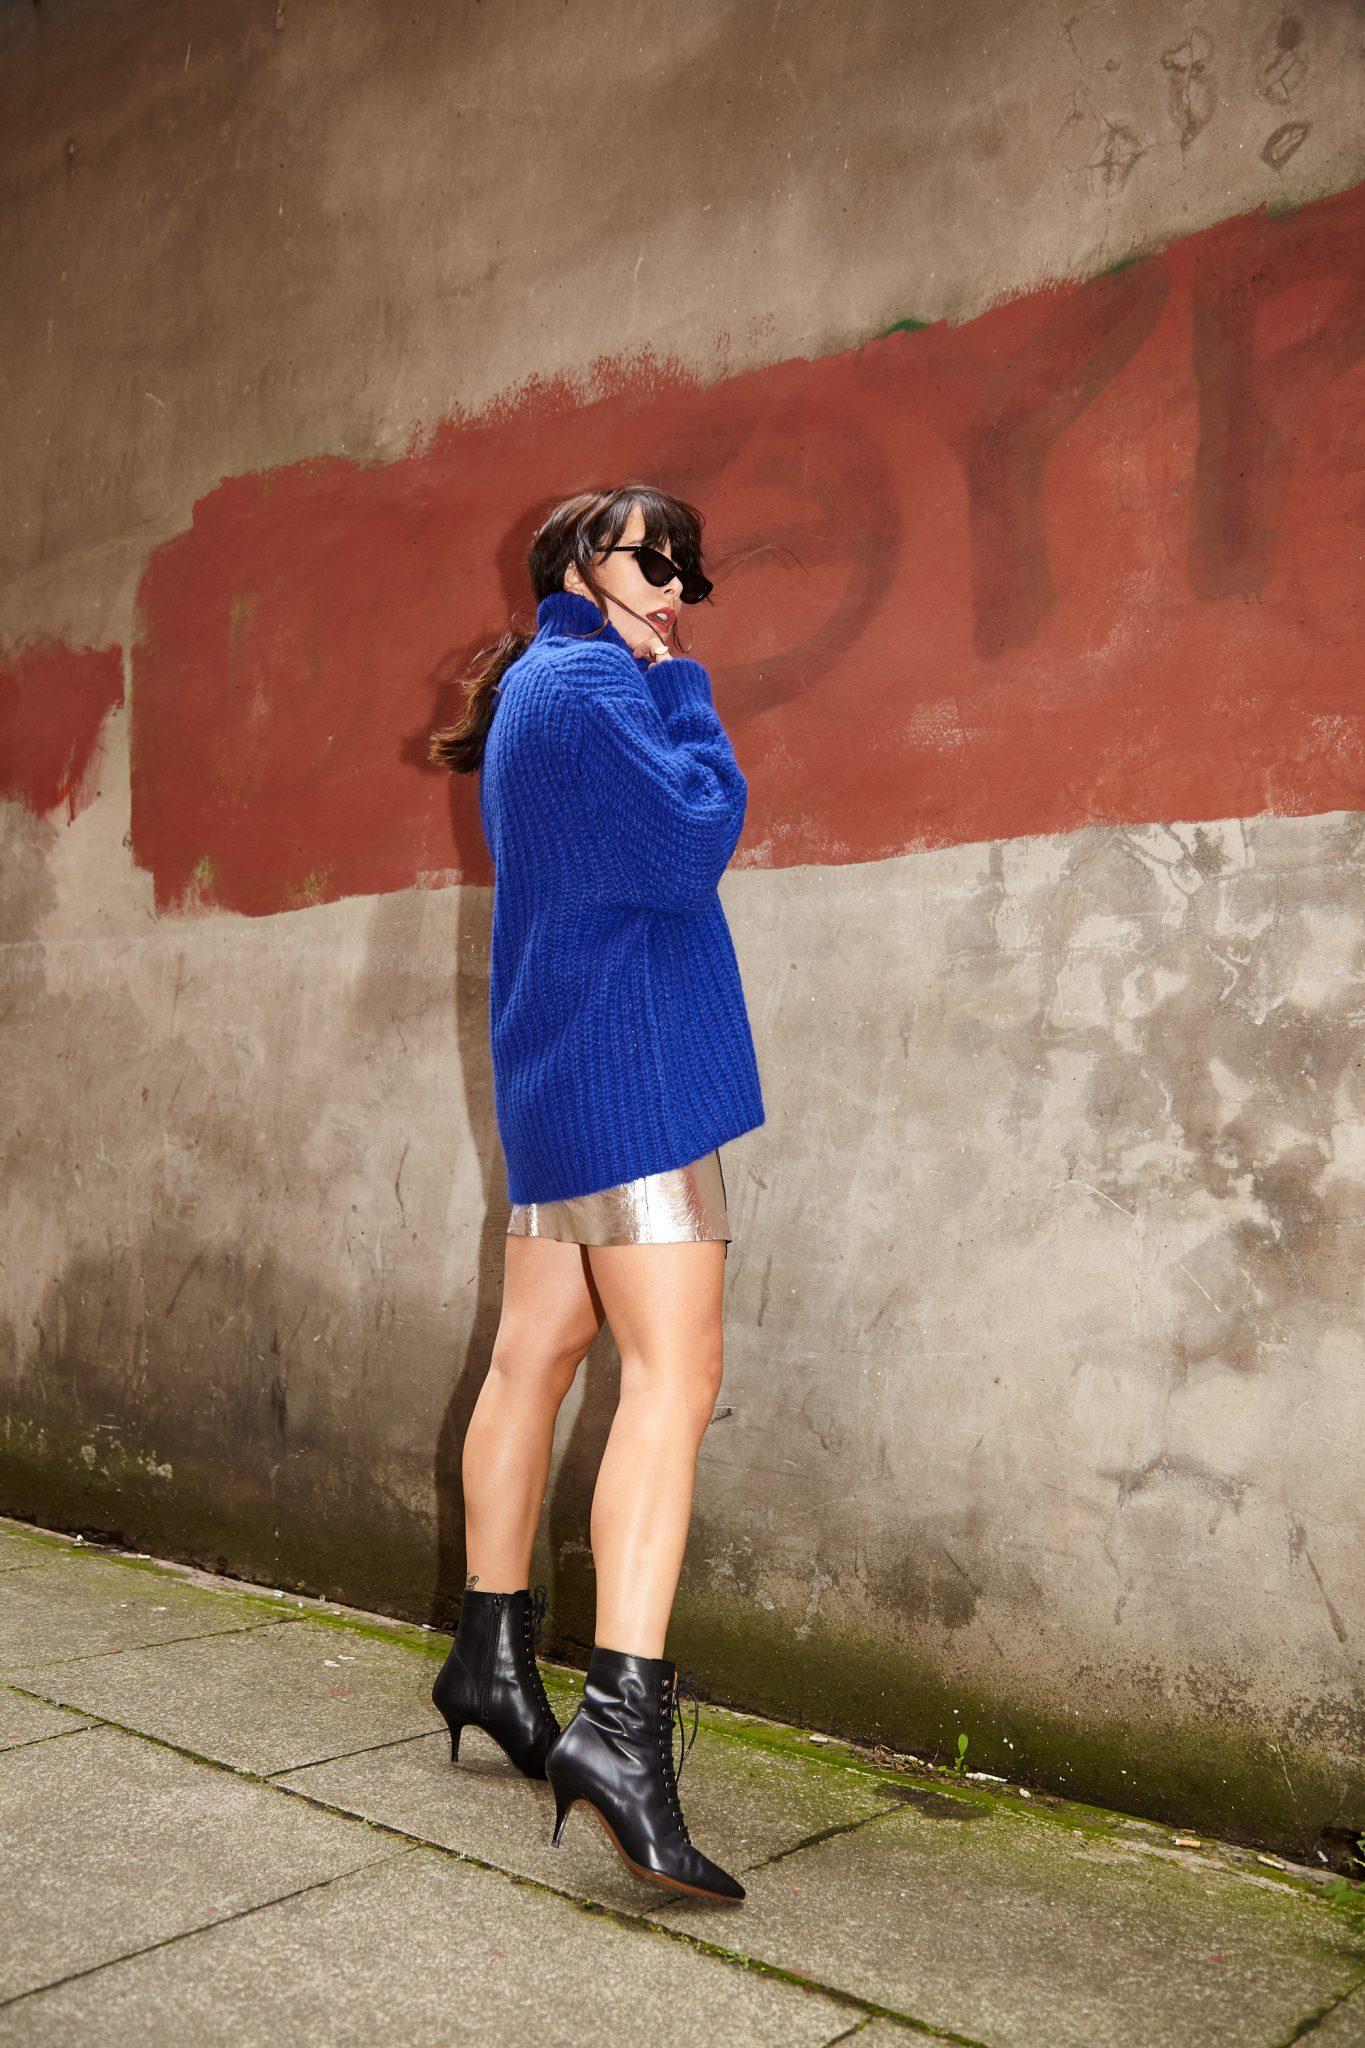 MEGAN ELLABY HOW TO WEAR COBALT BLUE